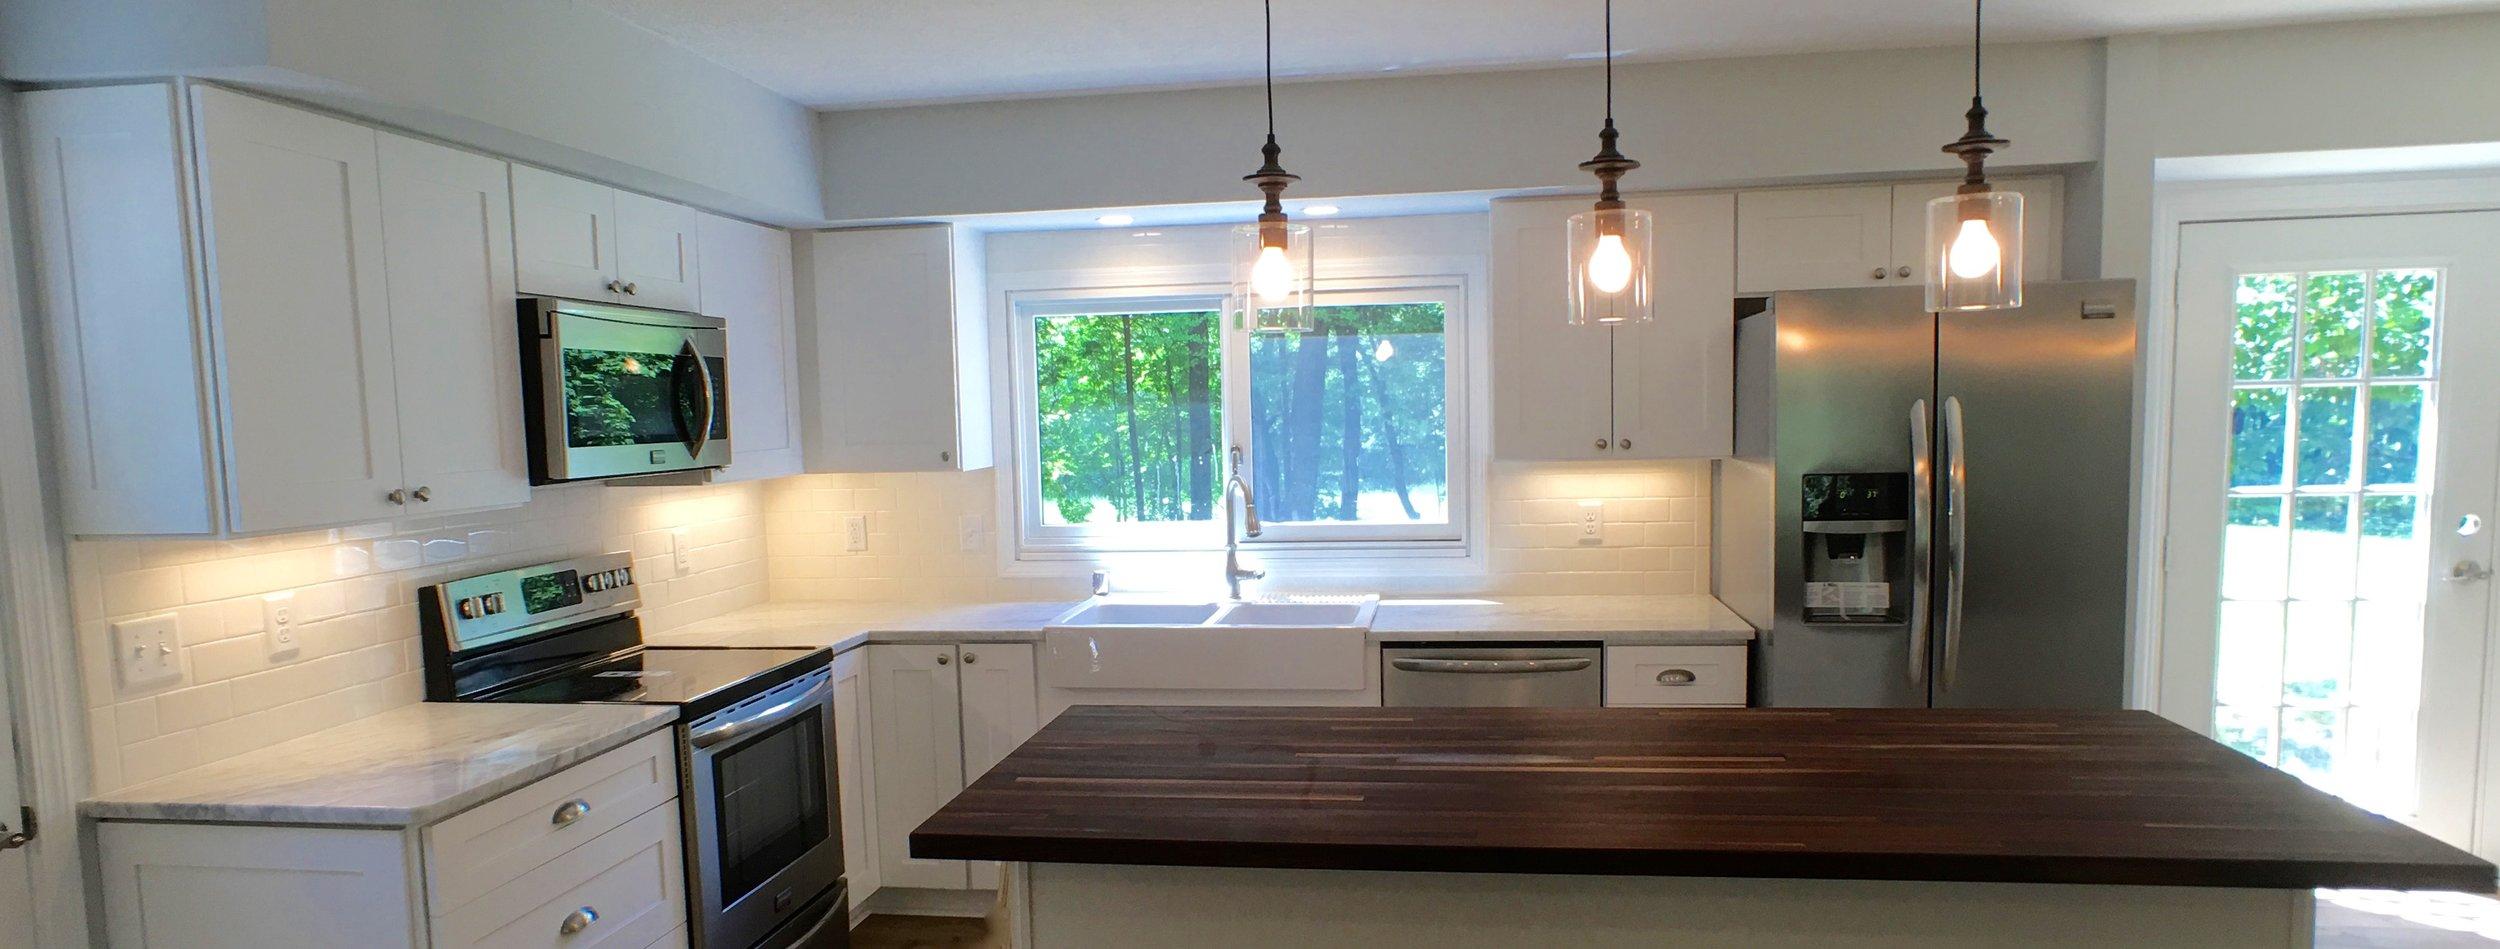 White kitchen with marble countertops, walnut butcher block, pendant lighting, stainless steel appliances, white farmhouse sink, subway tile backsplash, and under cabinet lighting